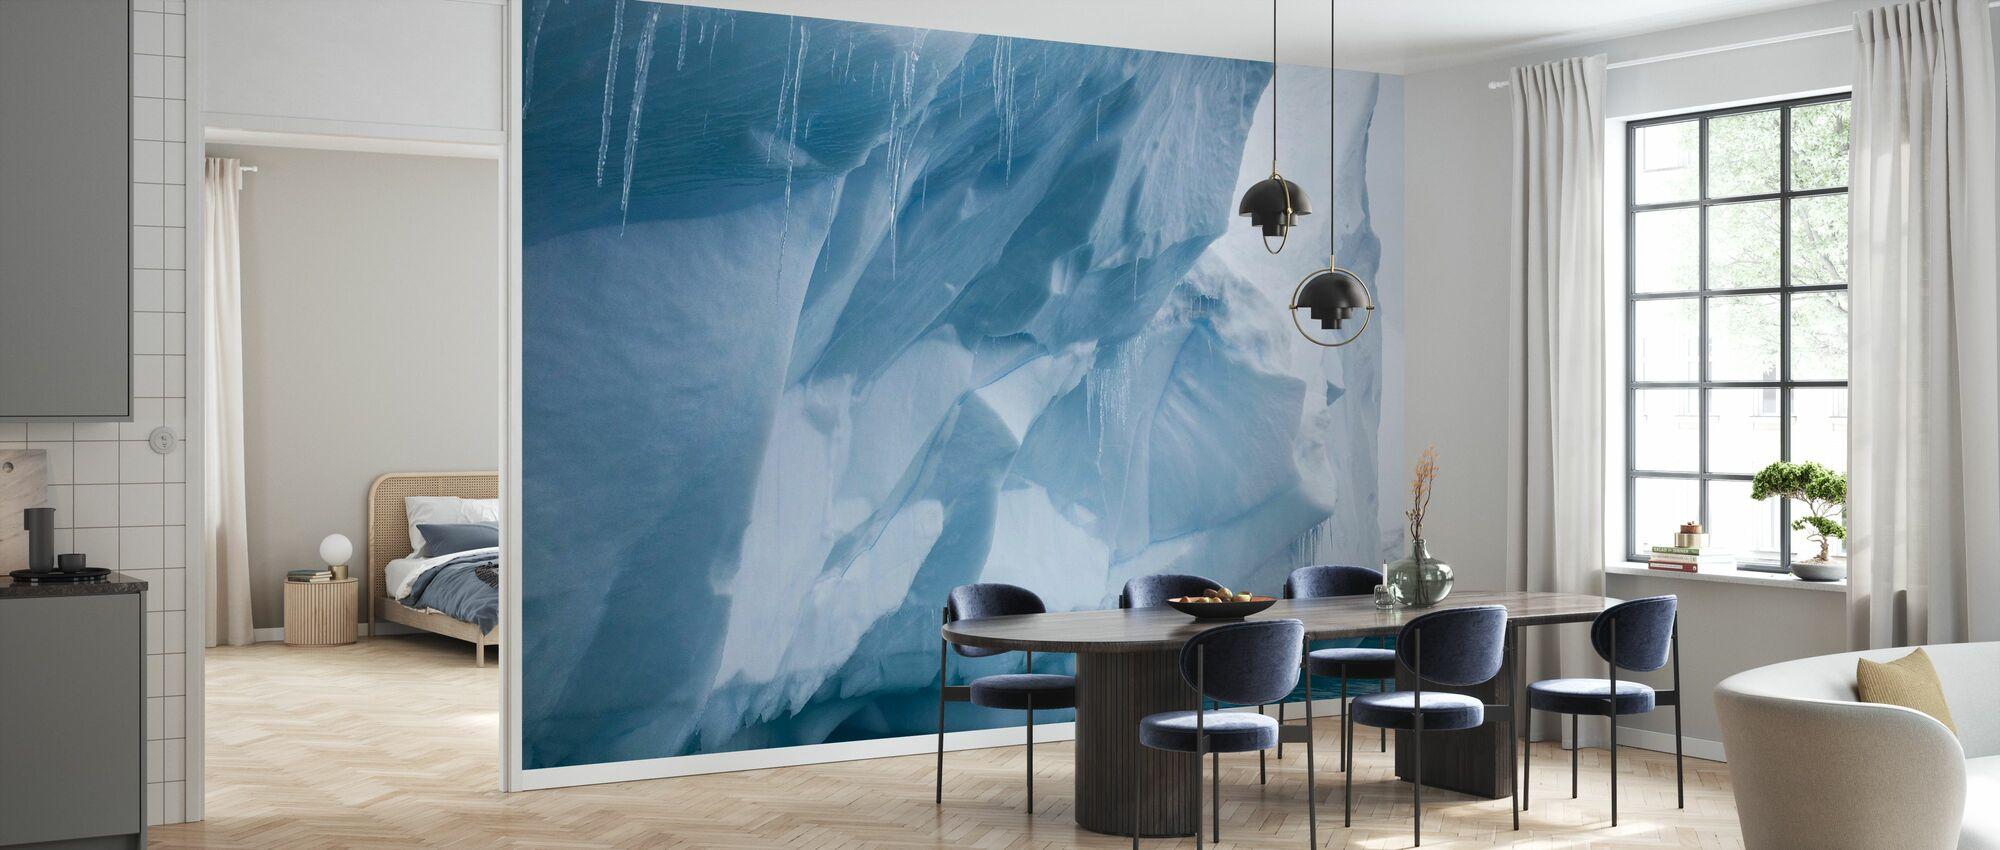 Icicle in Antarctica - Wallpaper - Kitchen